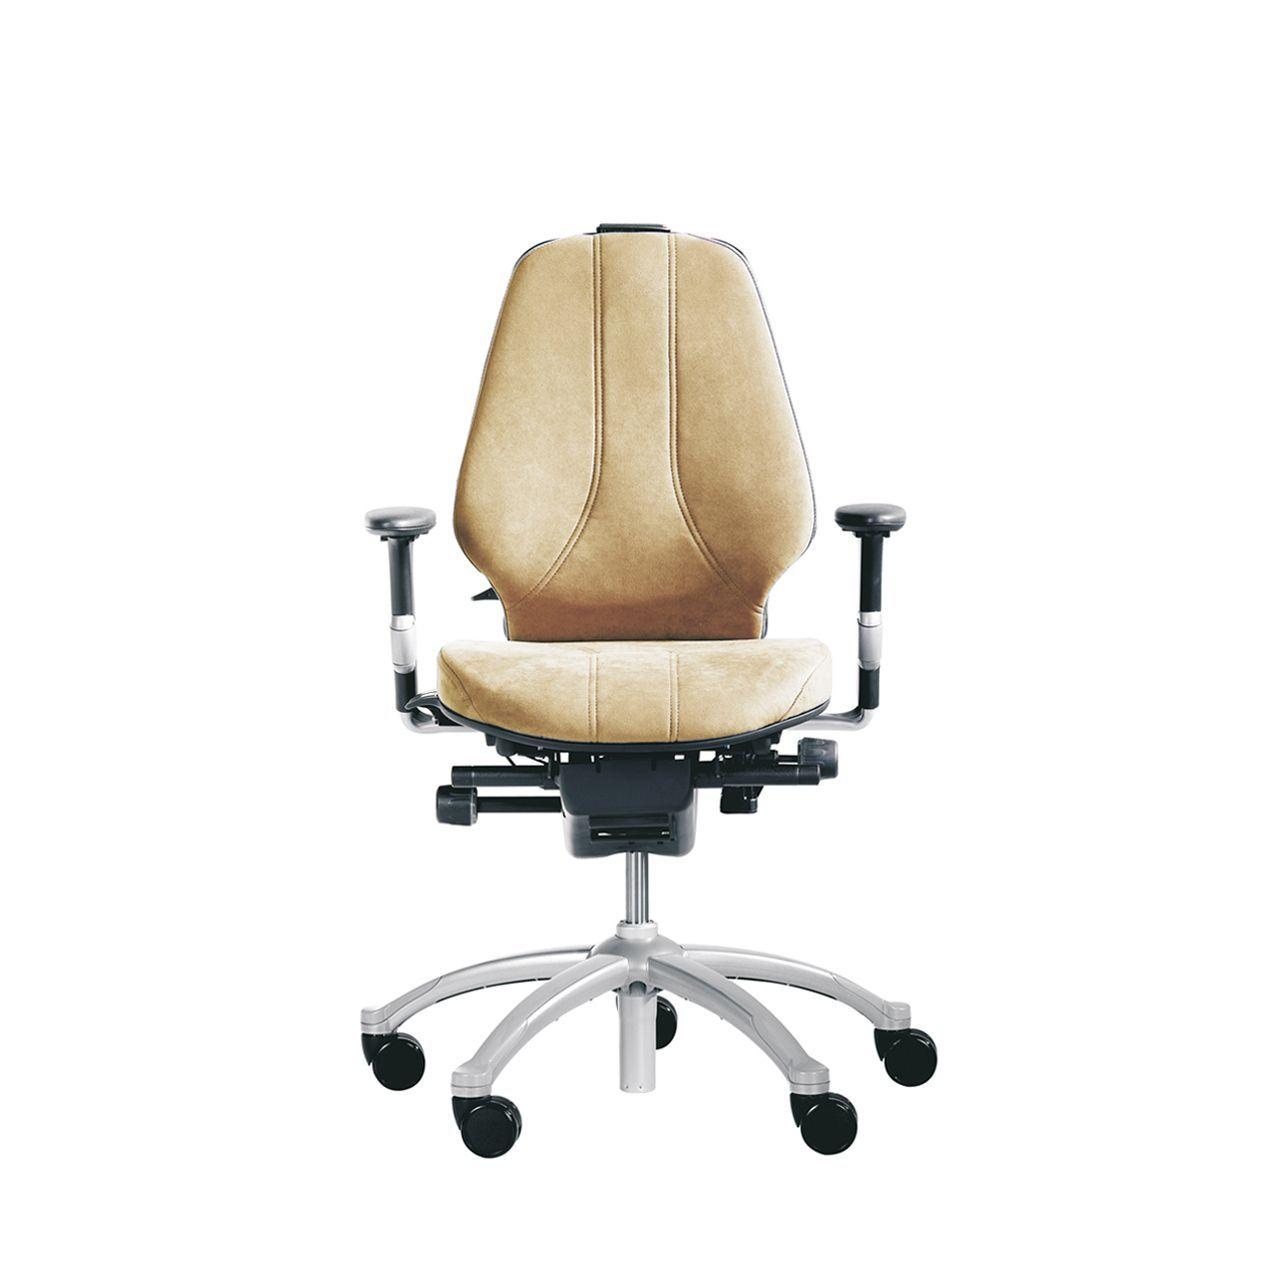 rh logic 300 xl bureaustoel STKALOG303 beige